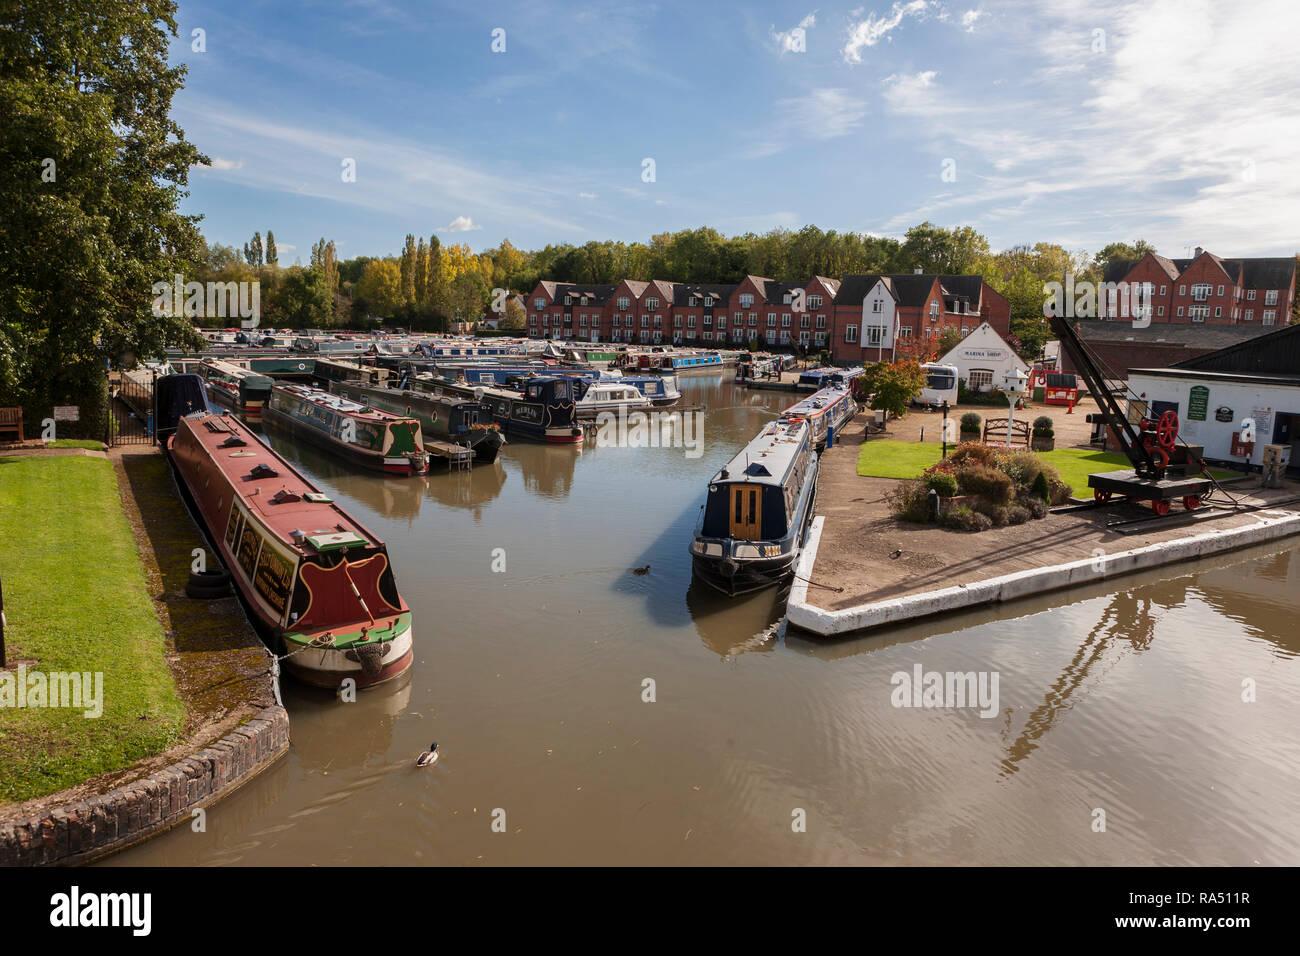 Braunston Marina and Wharf, Grand Union Canal, Braunston, Northamptonshire, England, UK - Stock Image